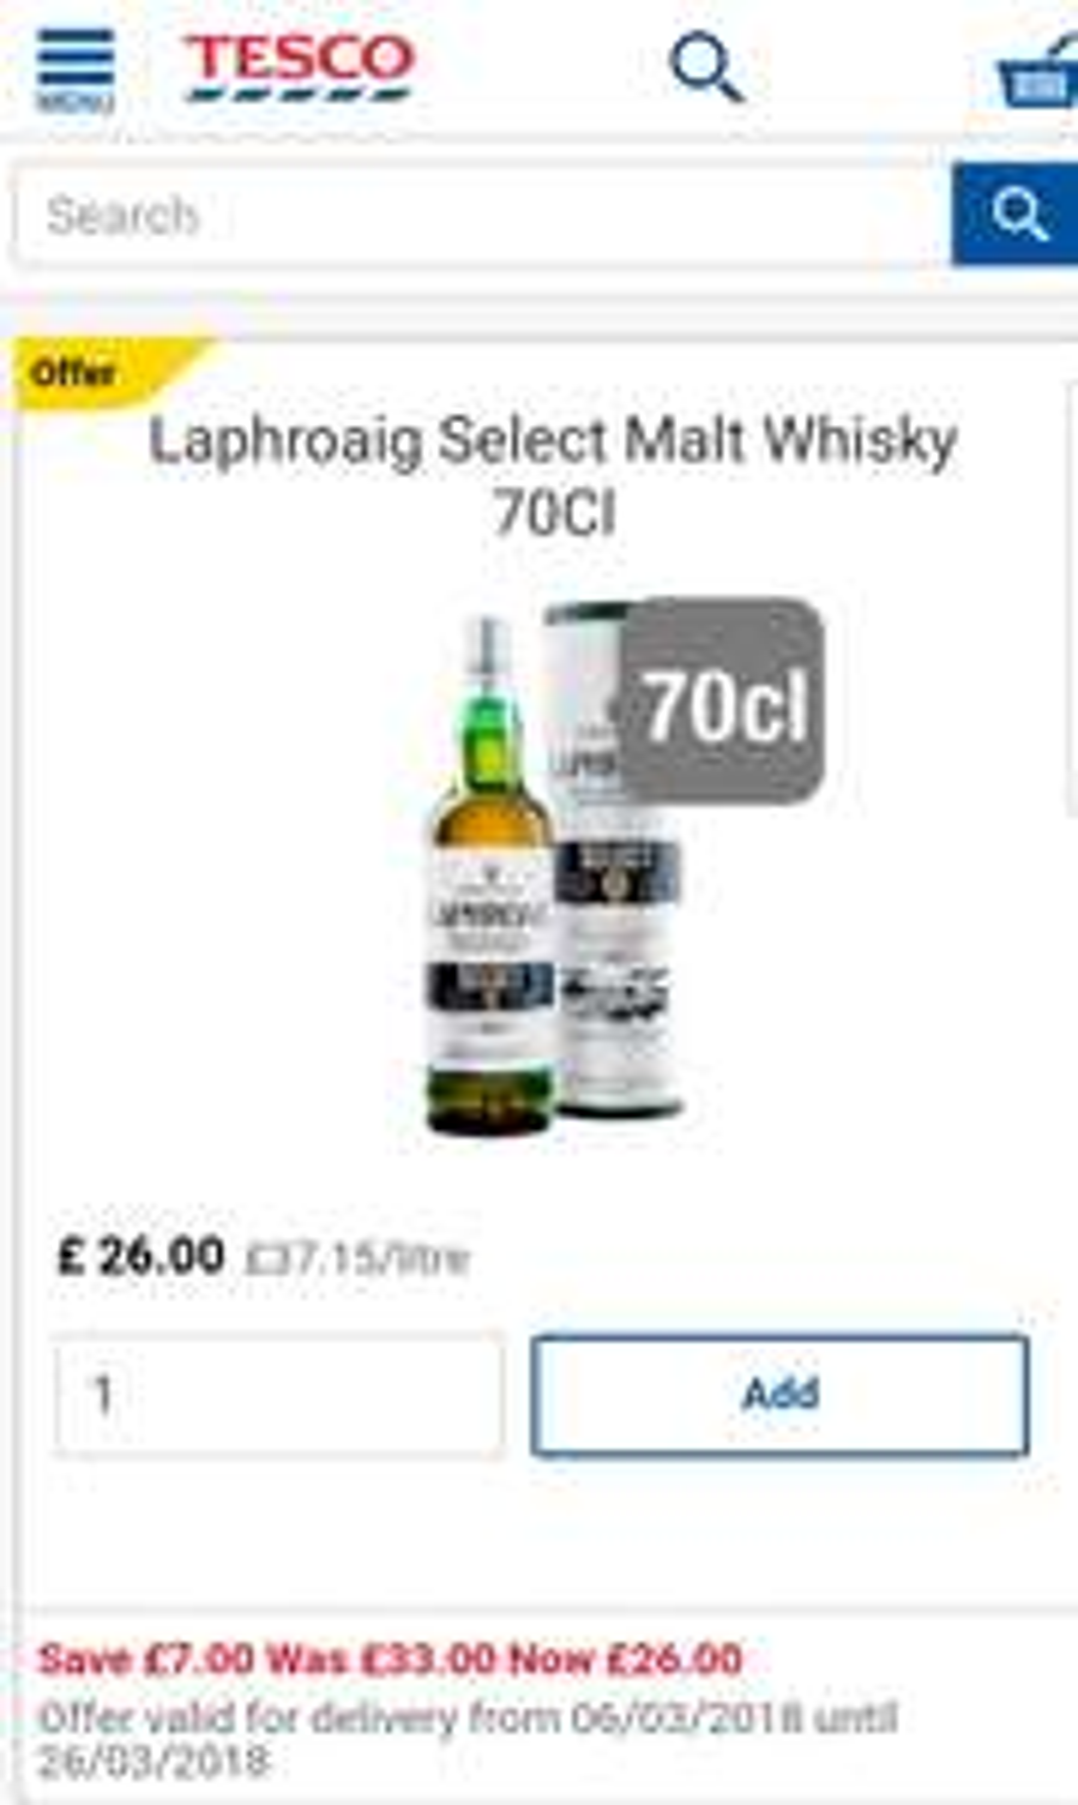 Laphroaig Select Malt 70cl Whisky £26 @ Tesco